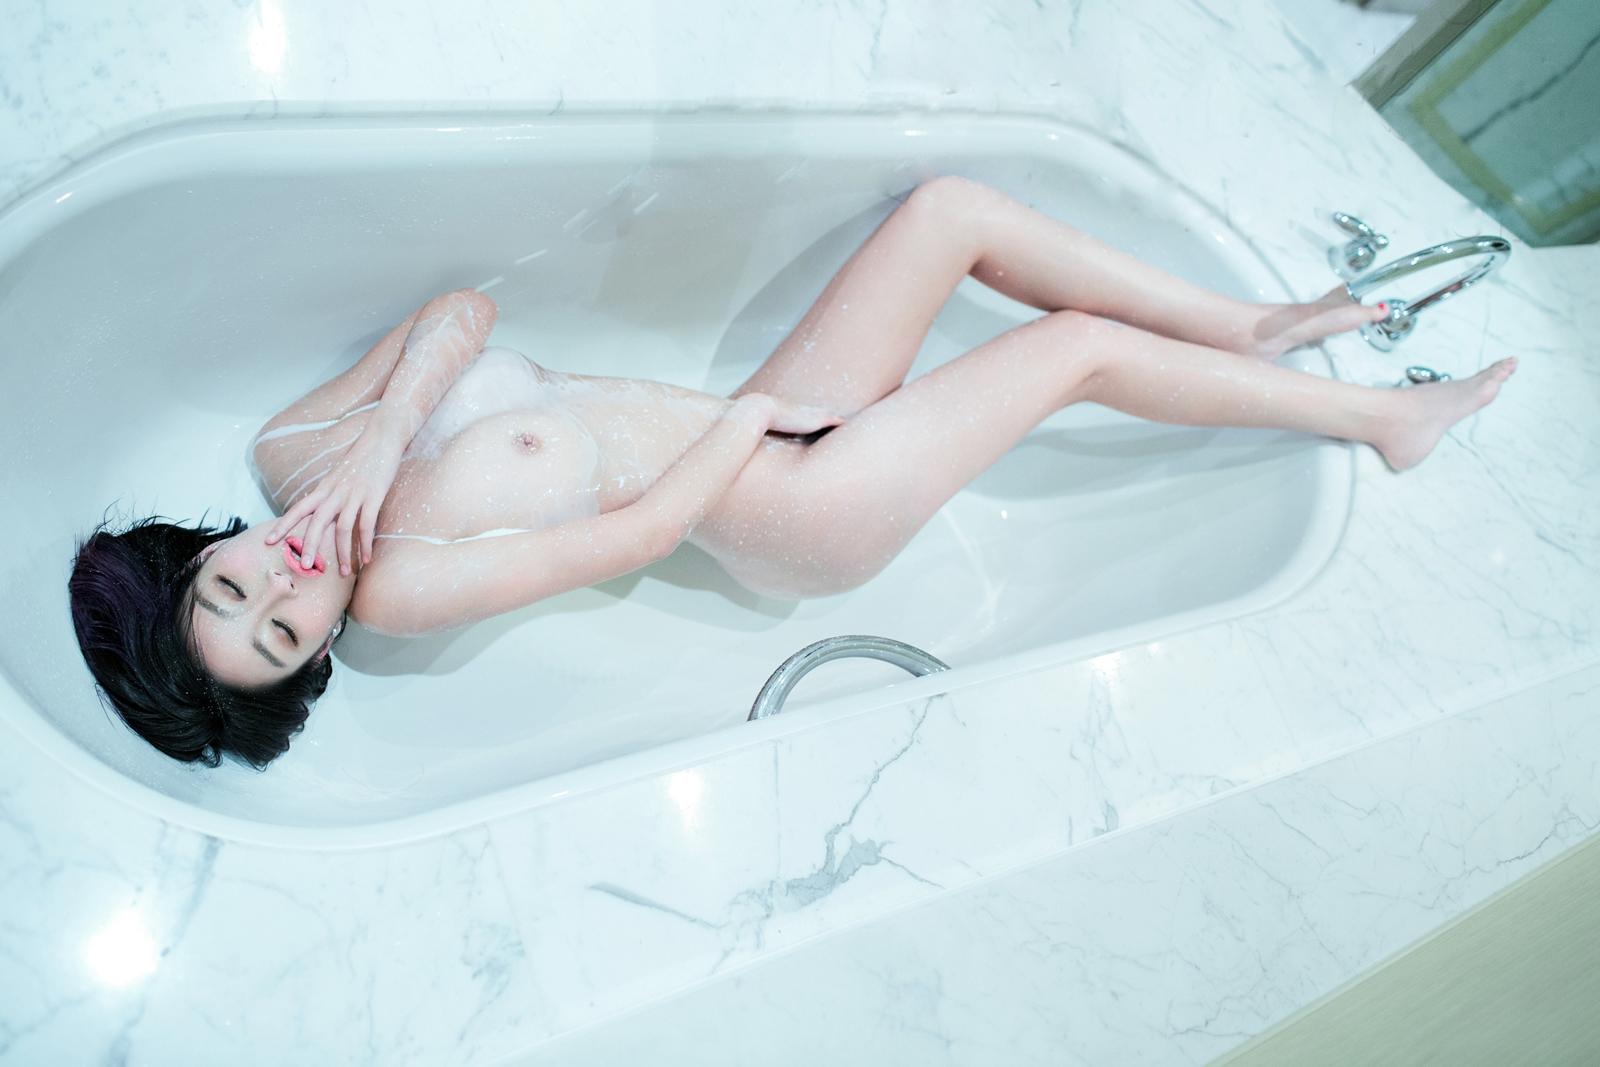 033 - Nude Girl TUIGIRL NO.45 Sexy Love Pussy